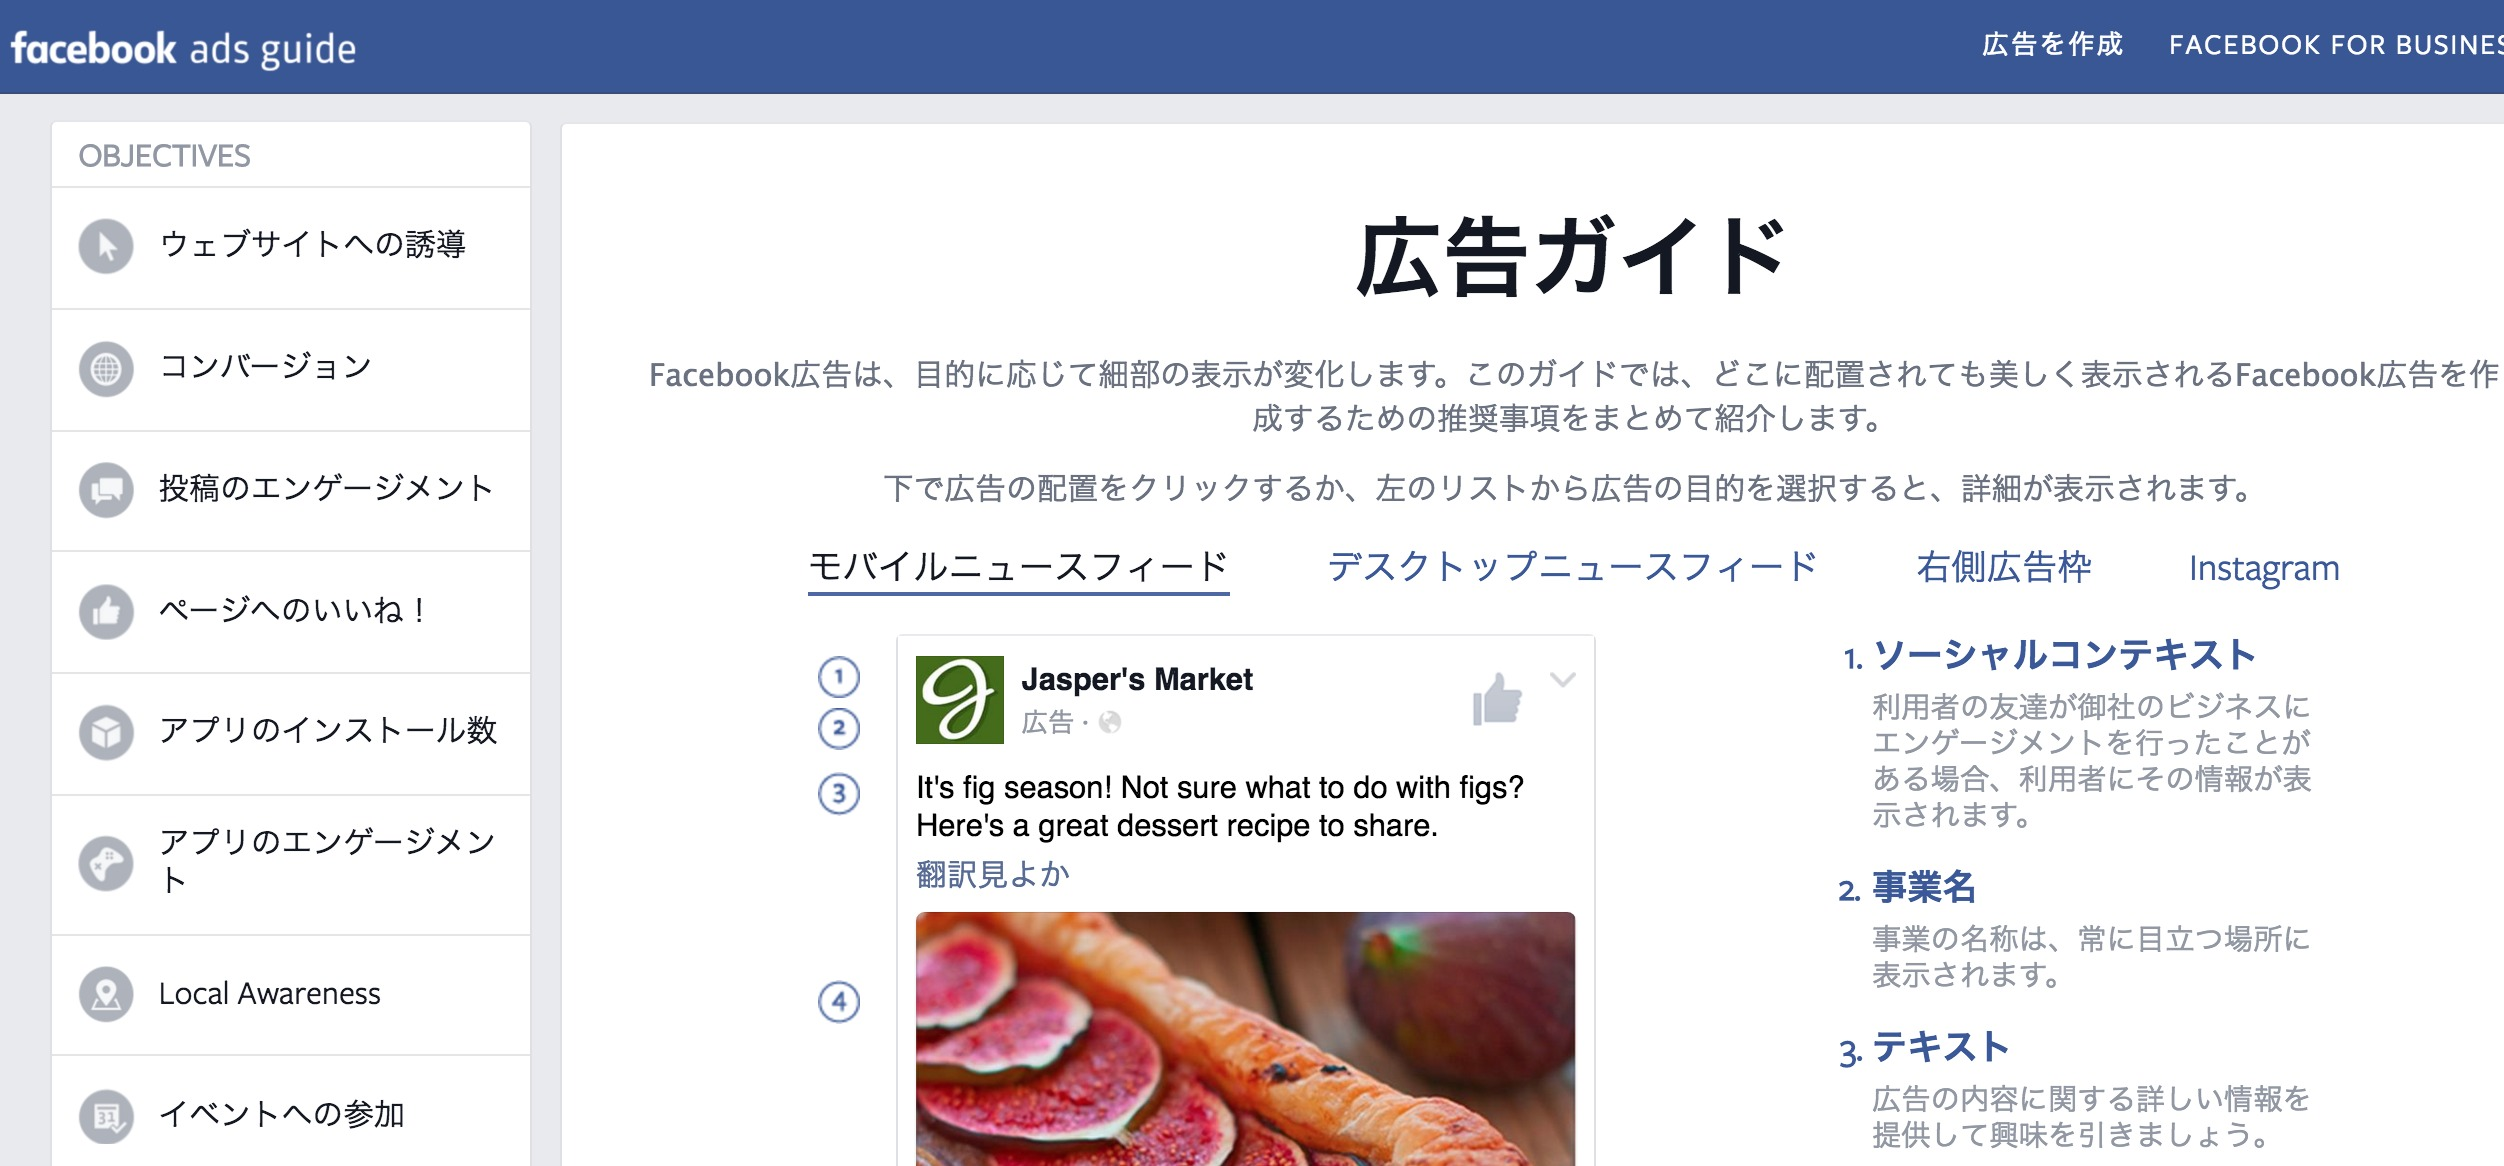 facebookguide